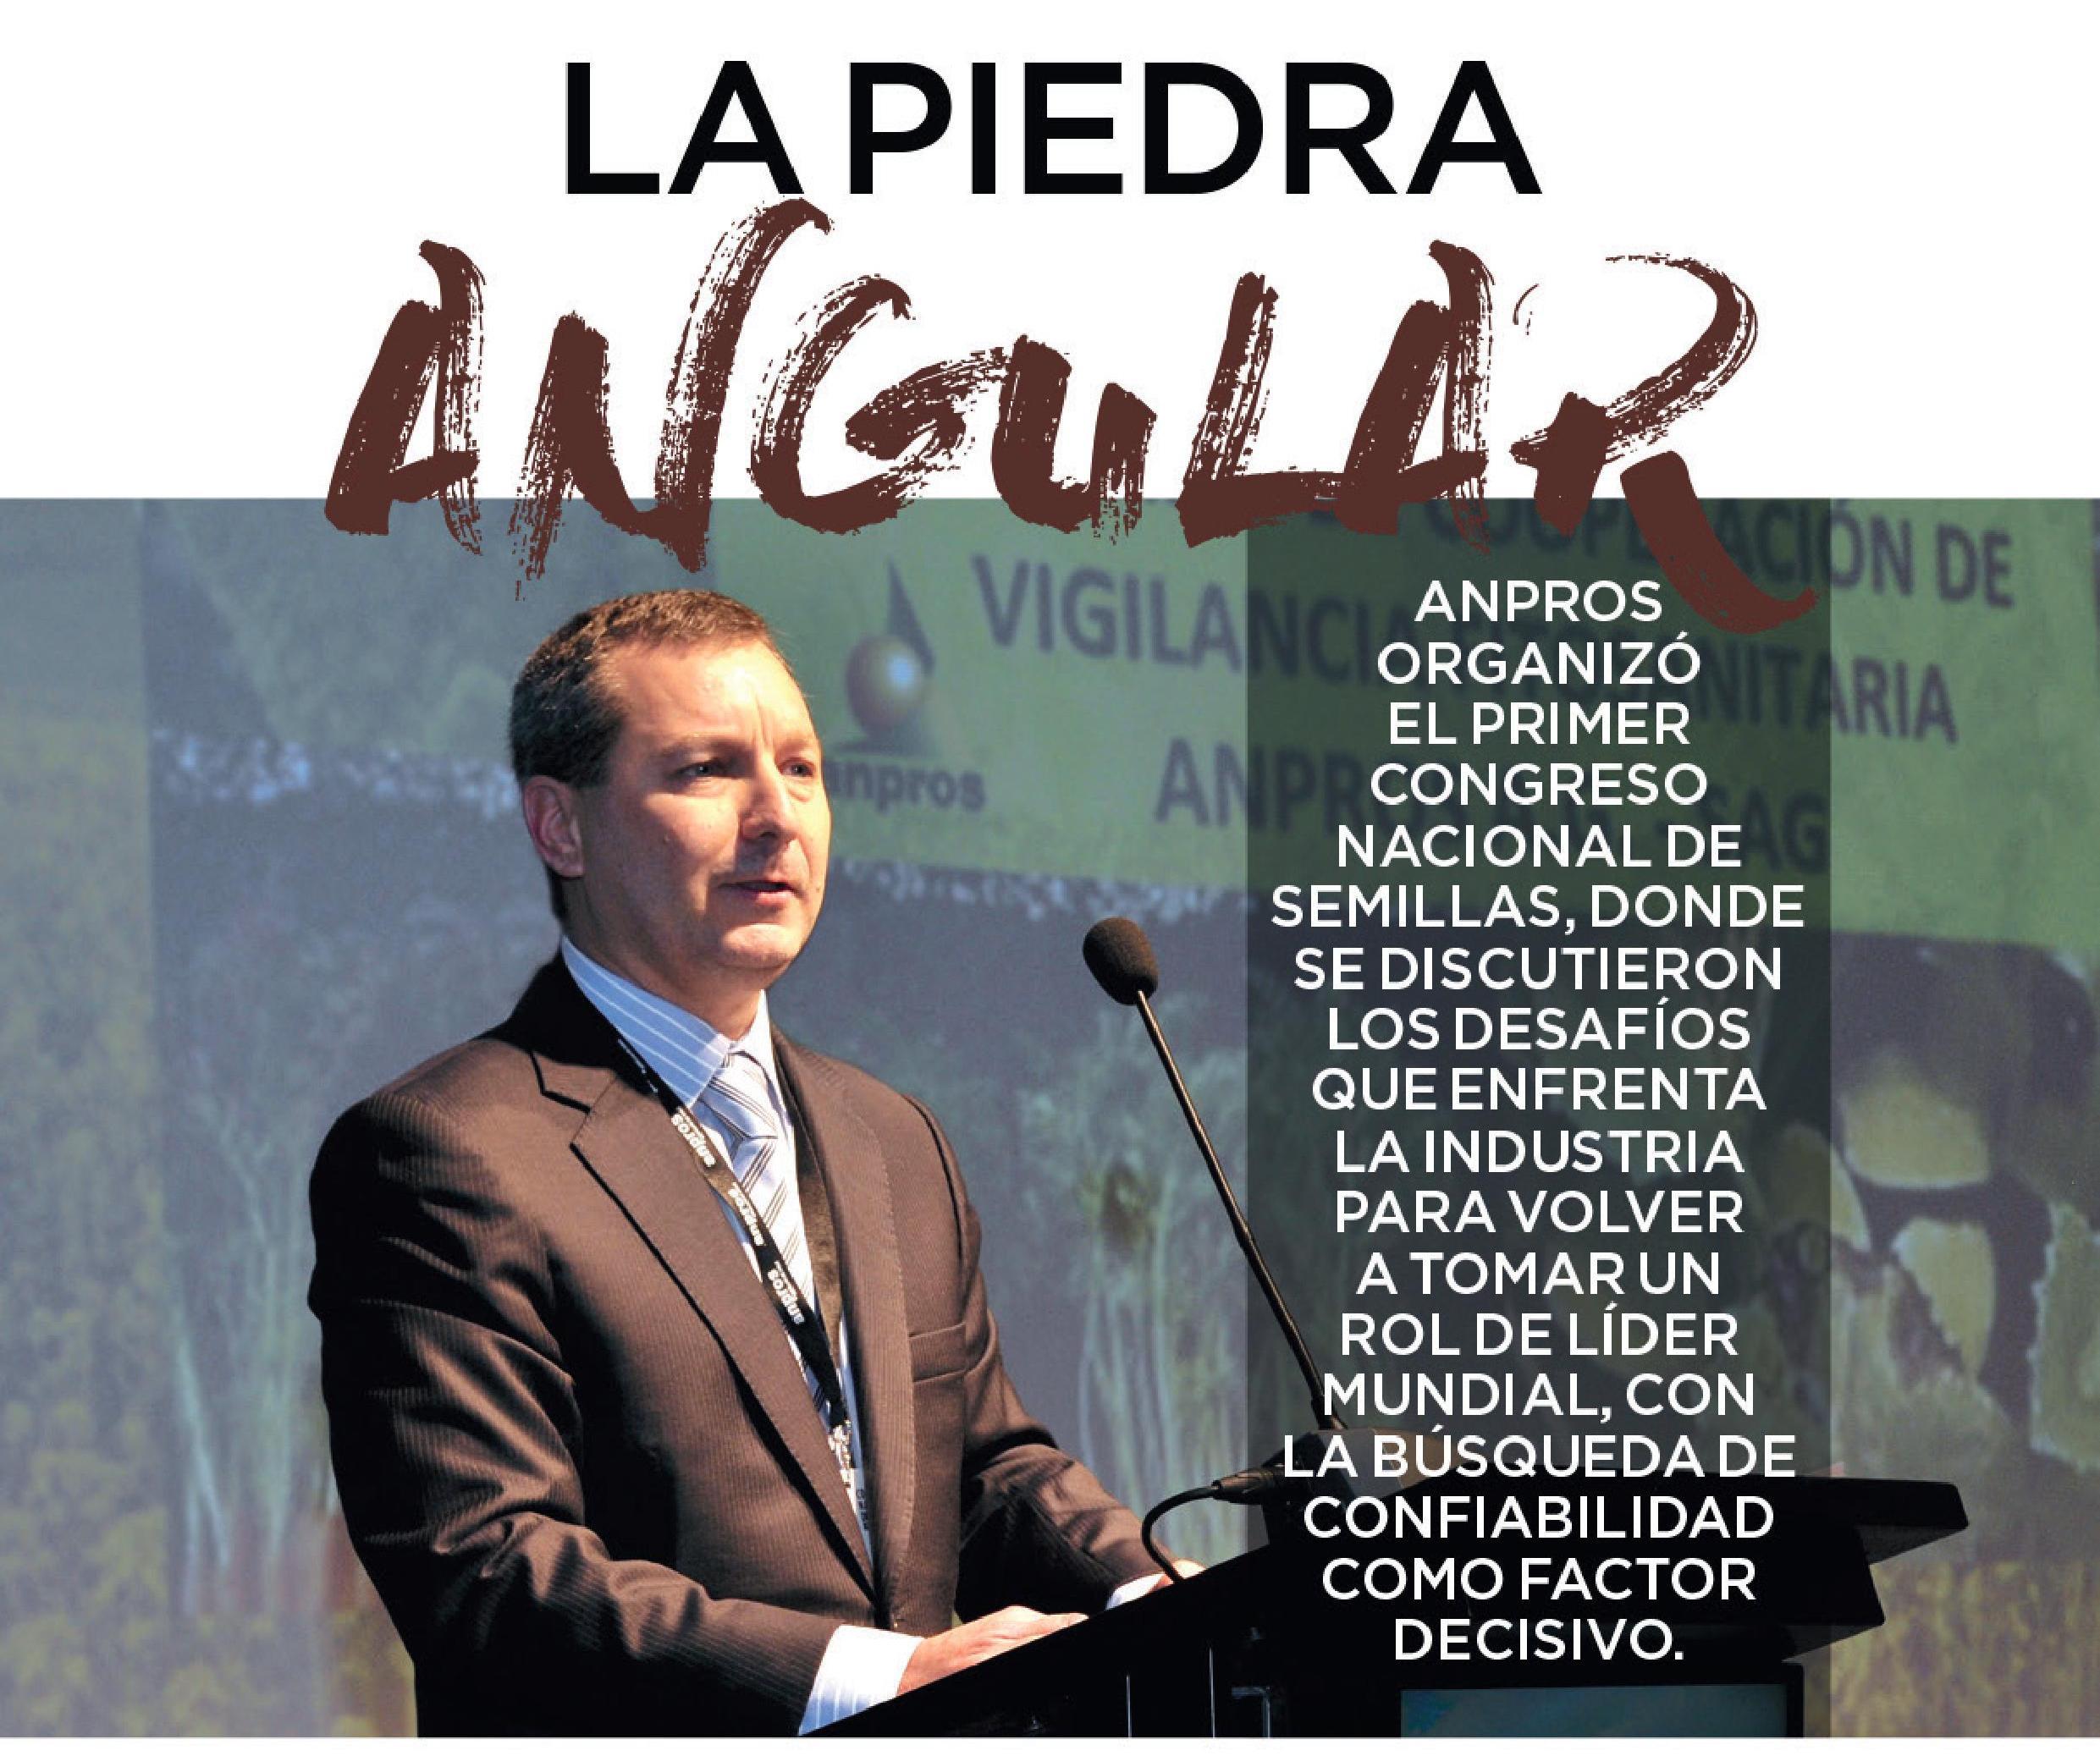 «La Piedra Angular»: Mundoagro destaca 1er Congreso Nacional de Semillas realizado por ANPROS.